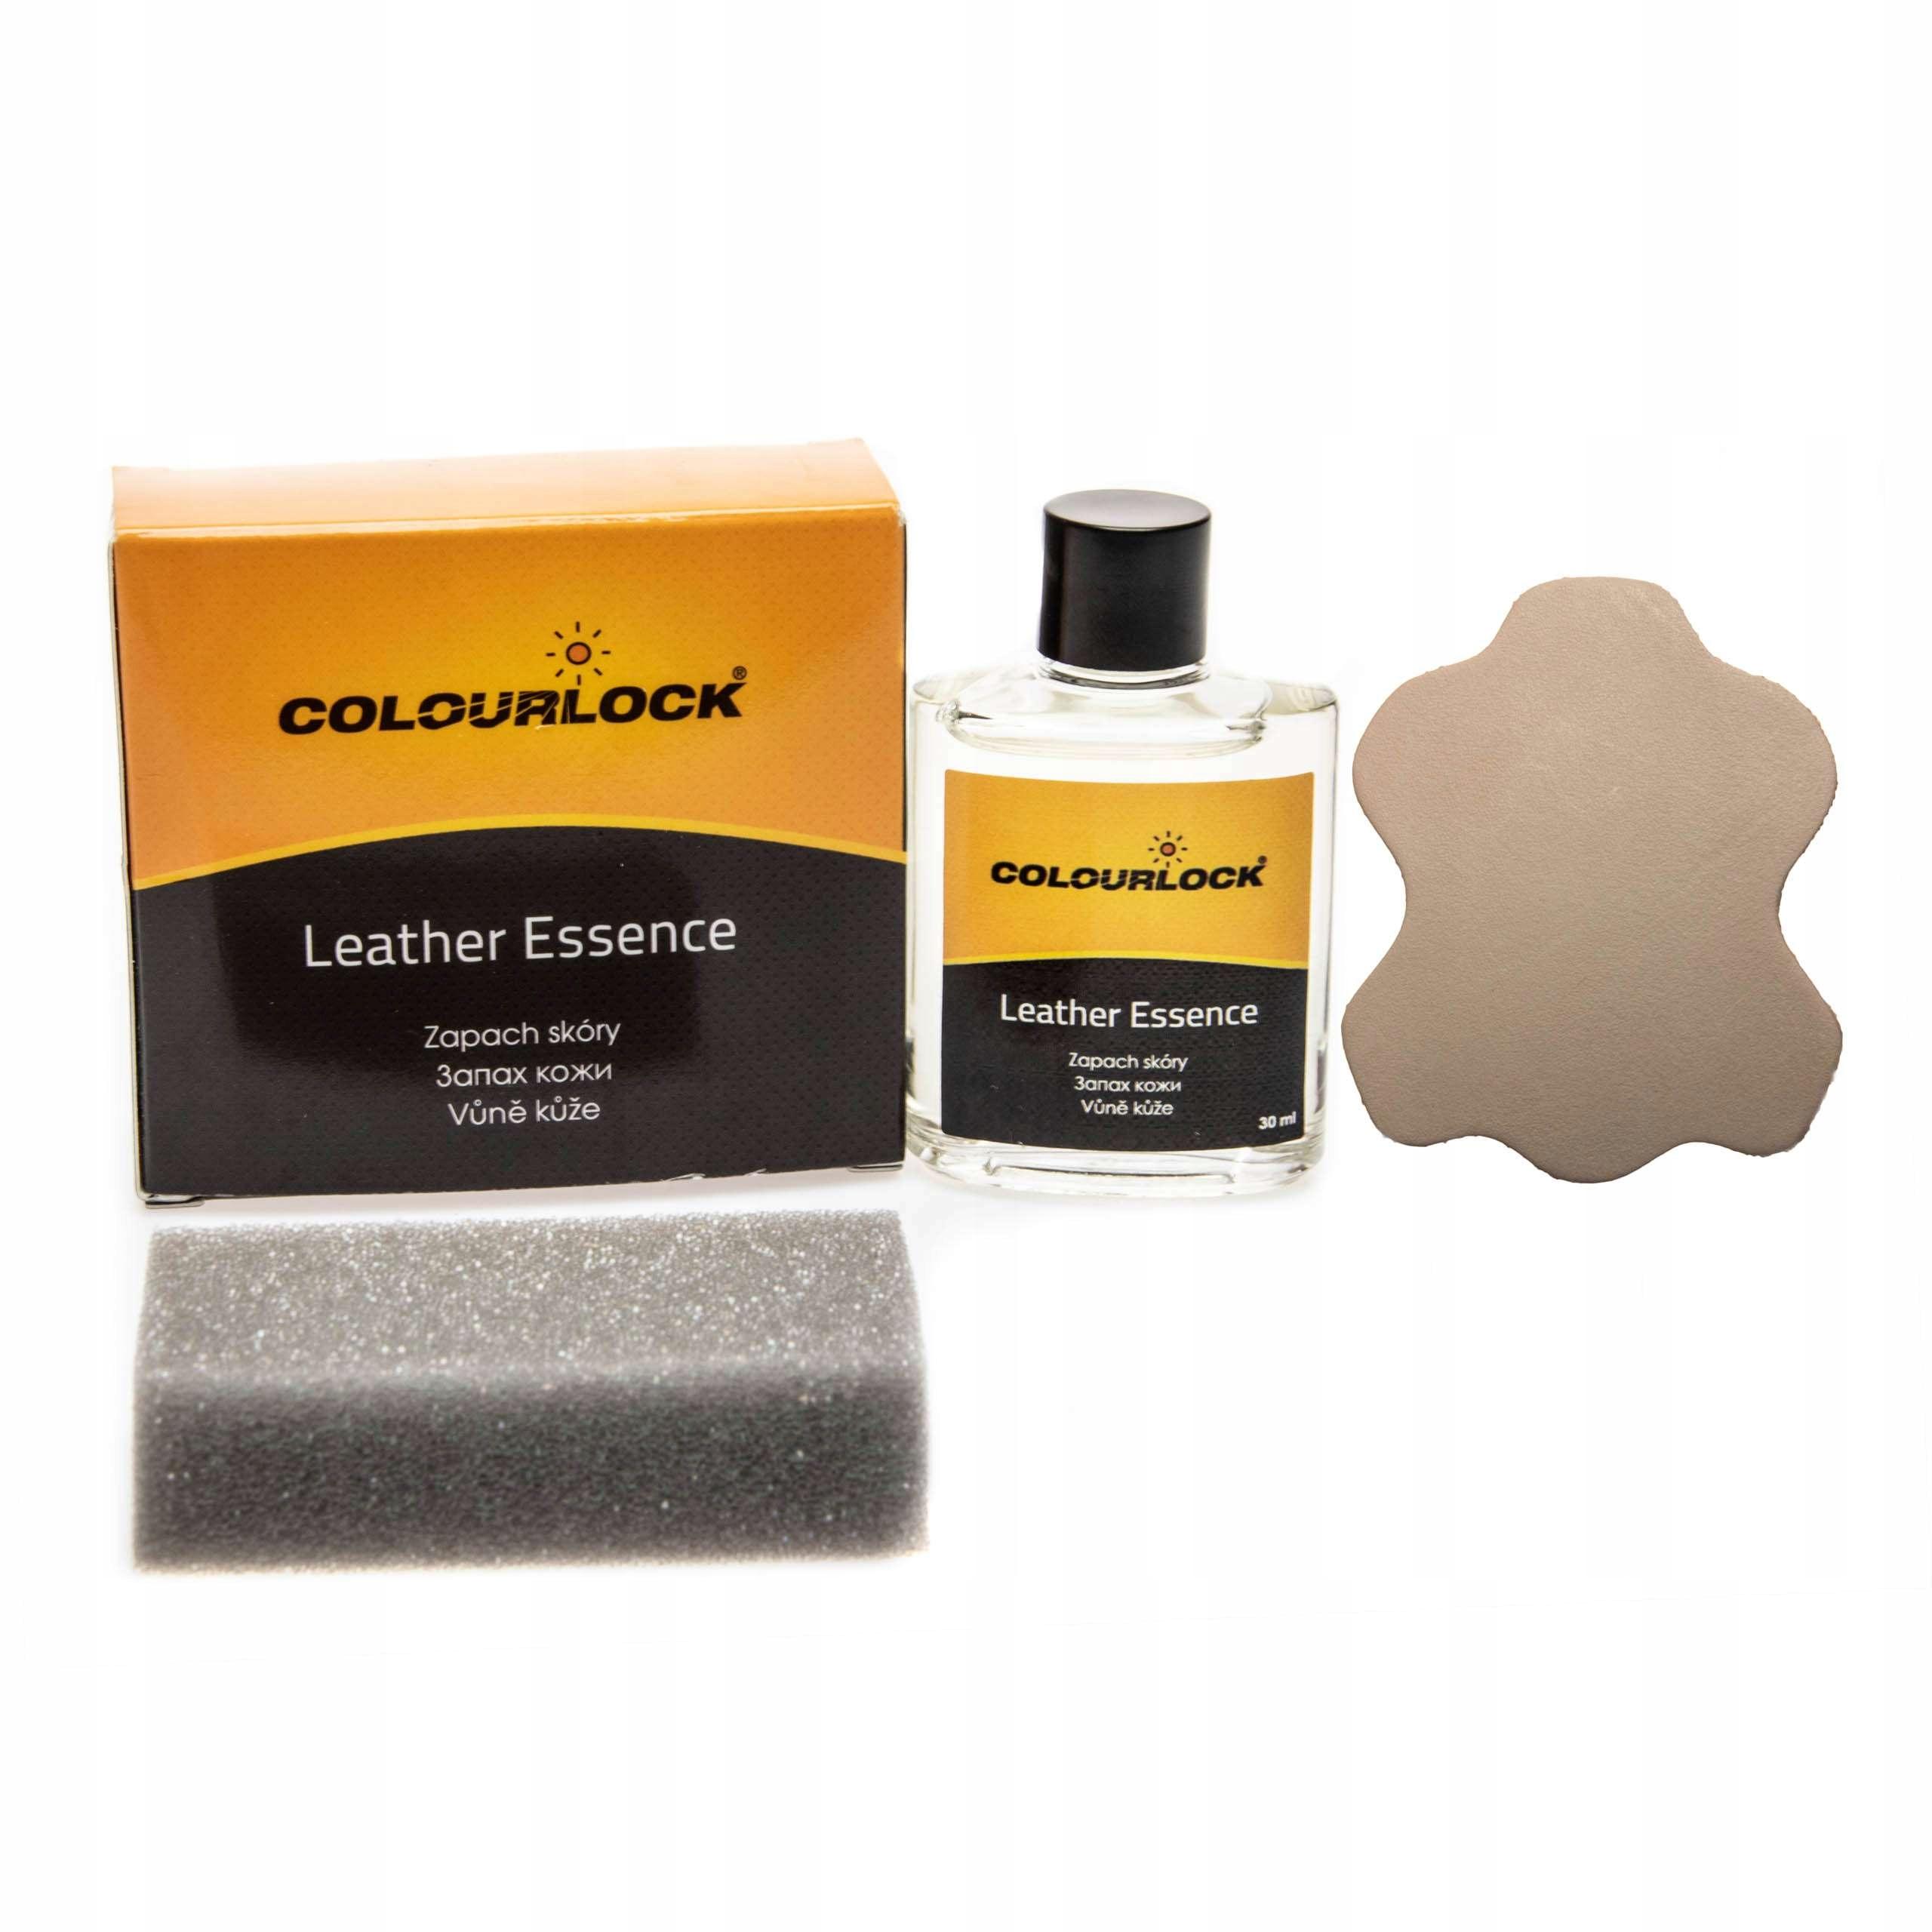 Colourlock Leather Essence zapach skóry 30ml